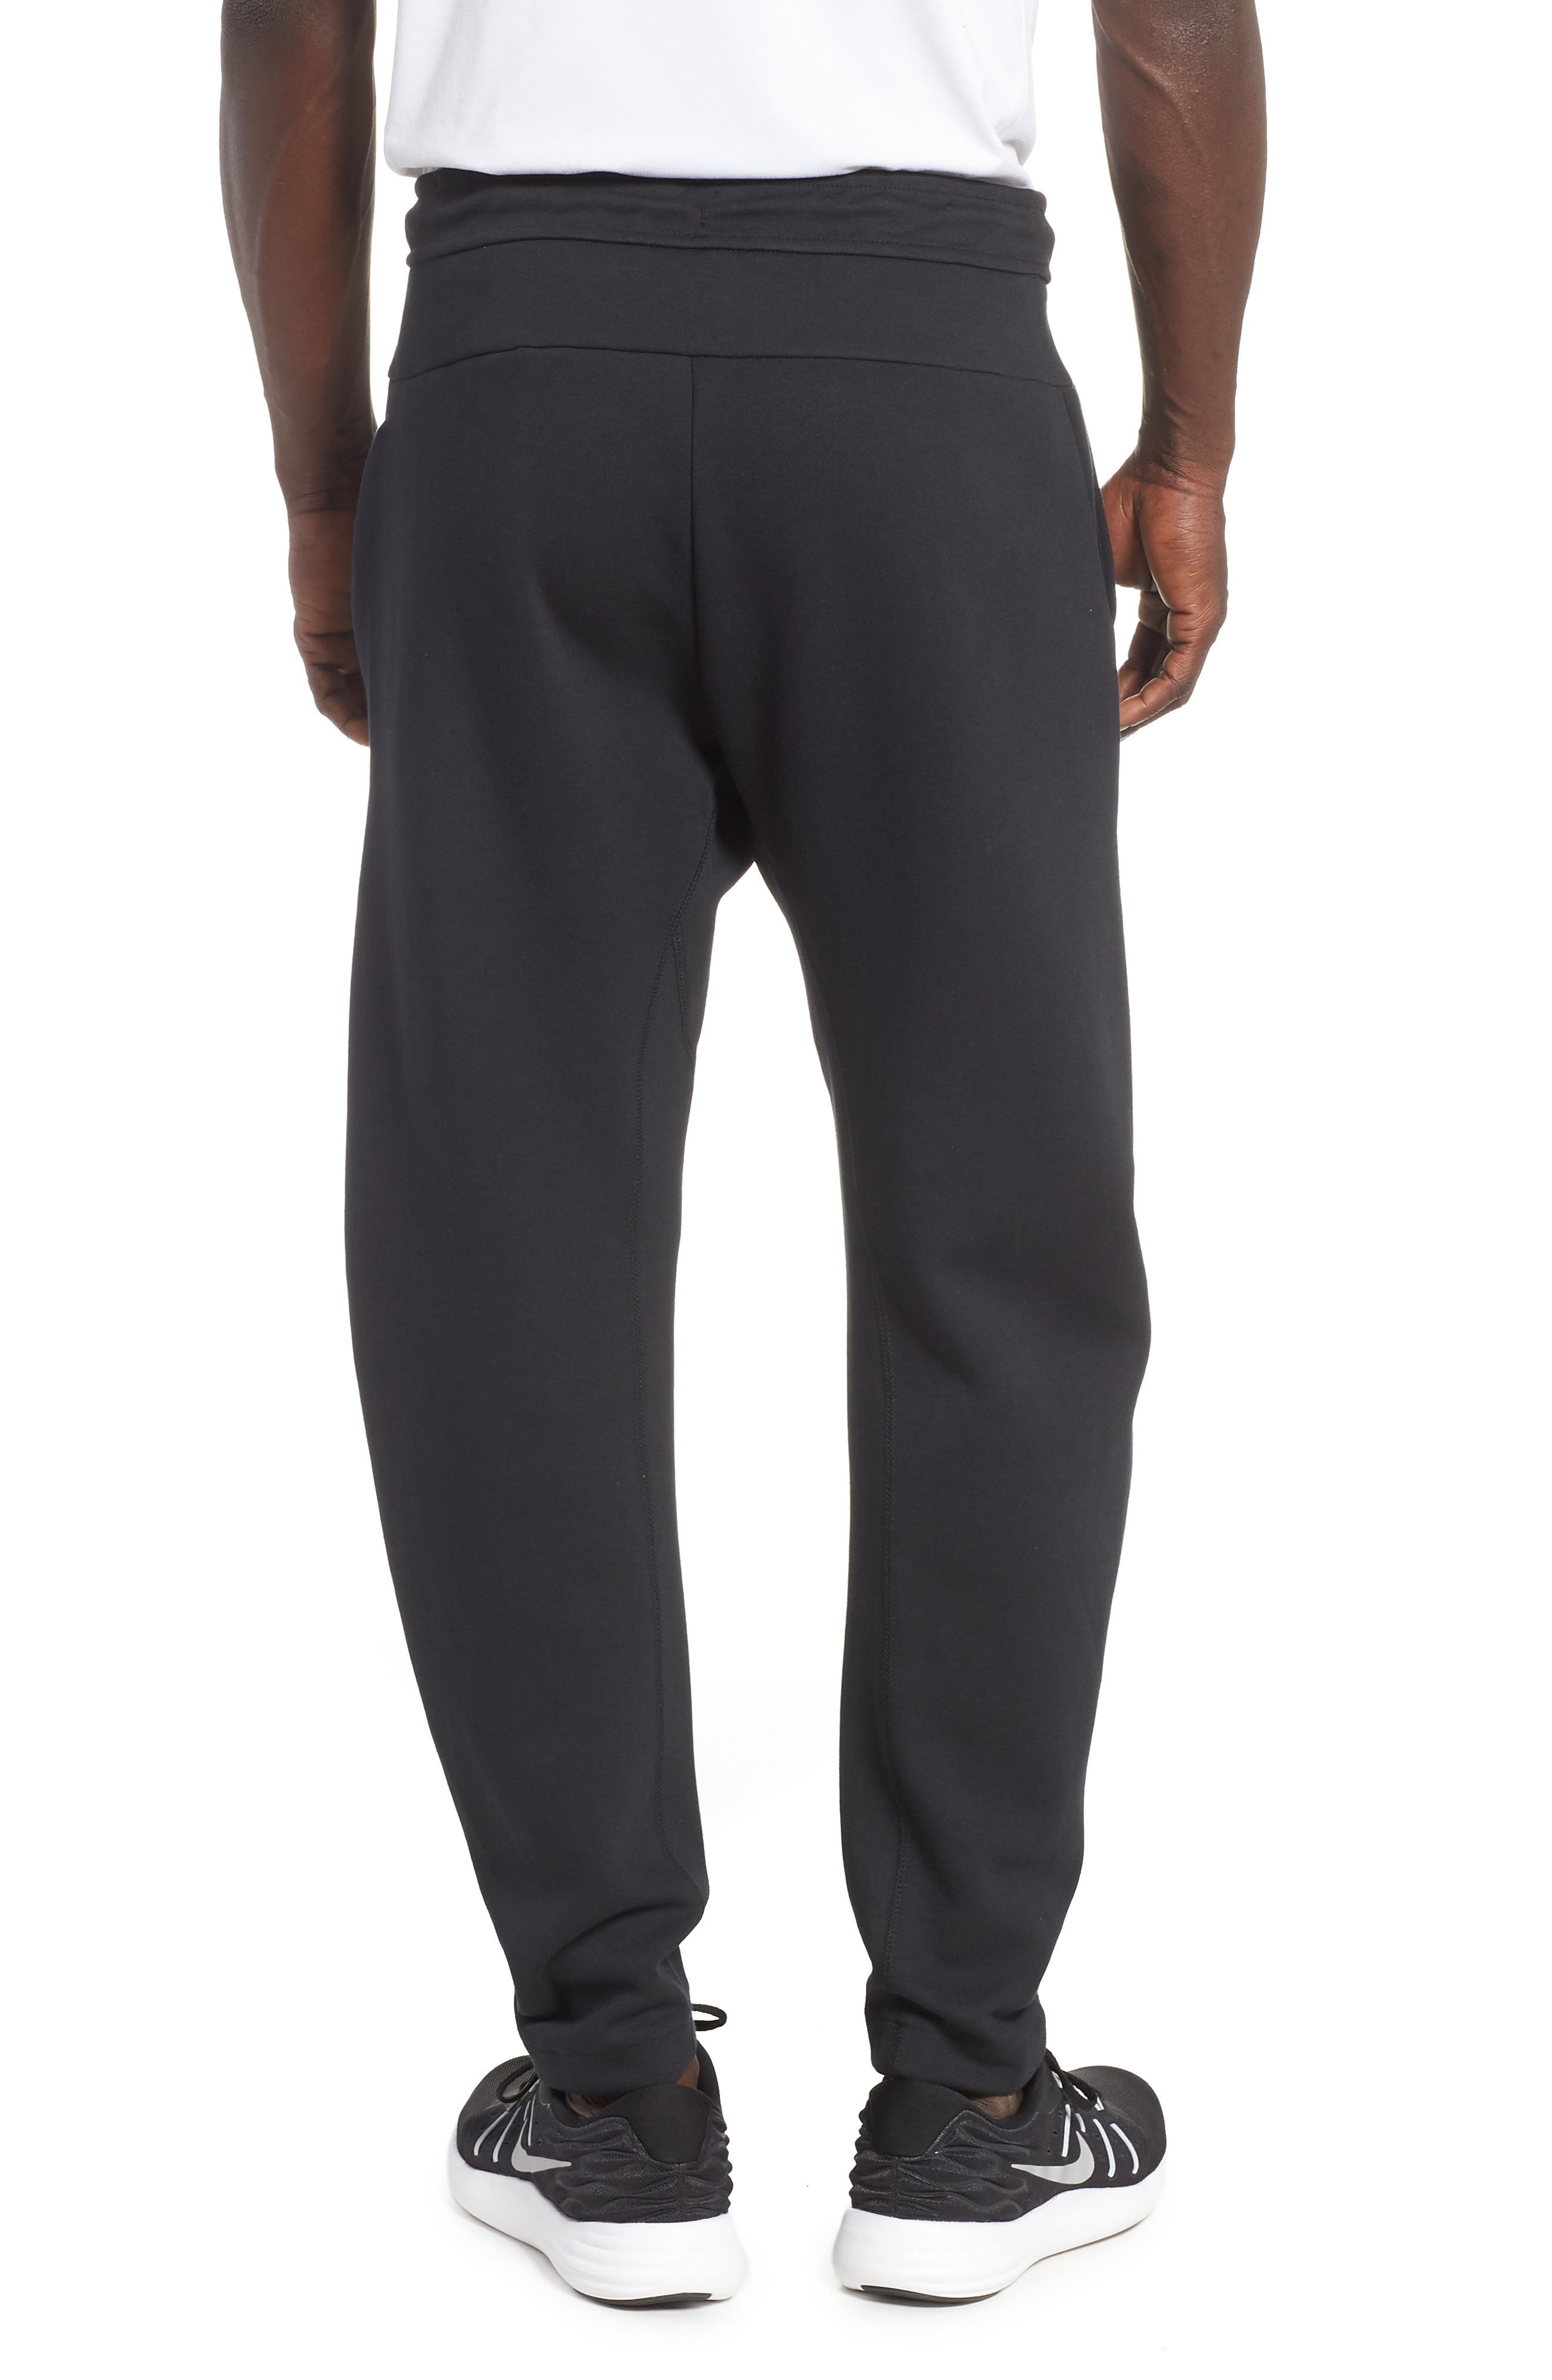 Tech Fleece Pants,                             Alternate thumbnail 2, color,                             BLACK/ BLACK